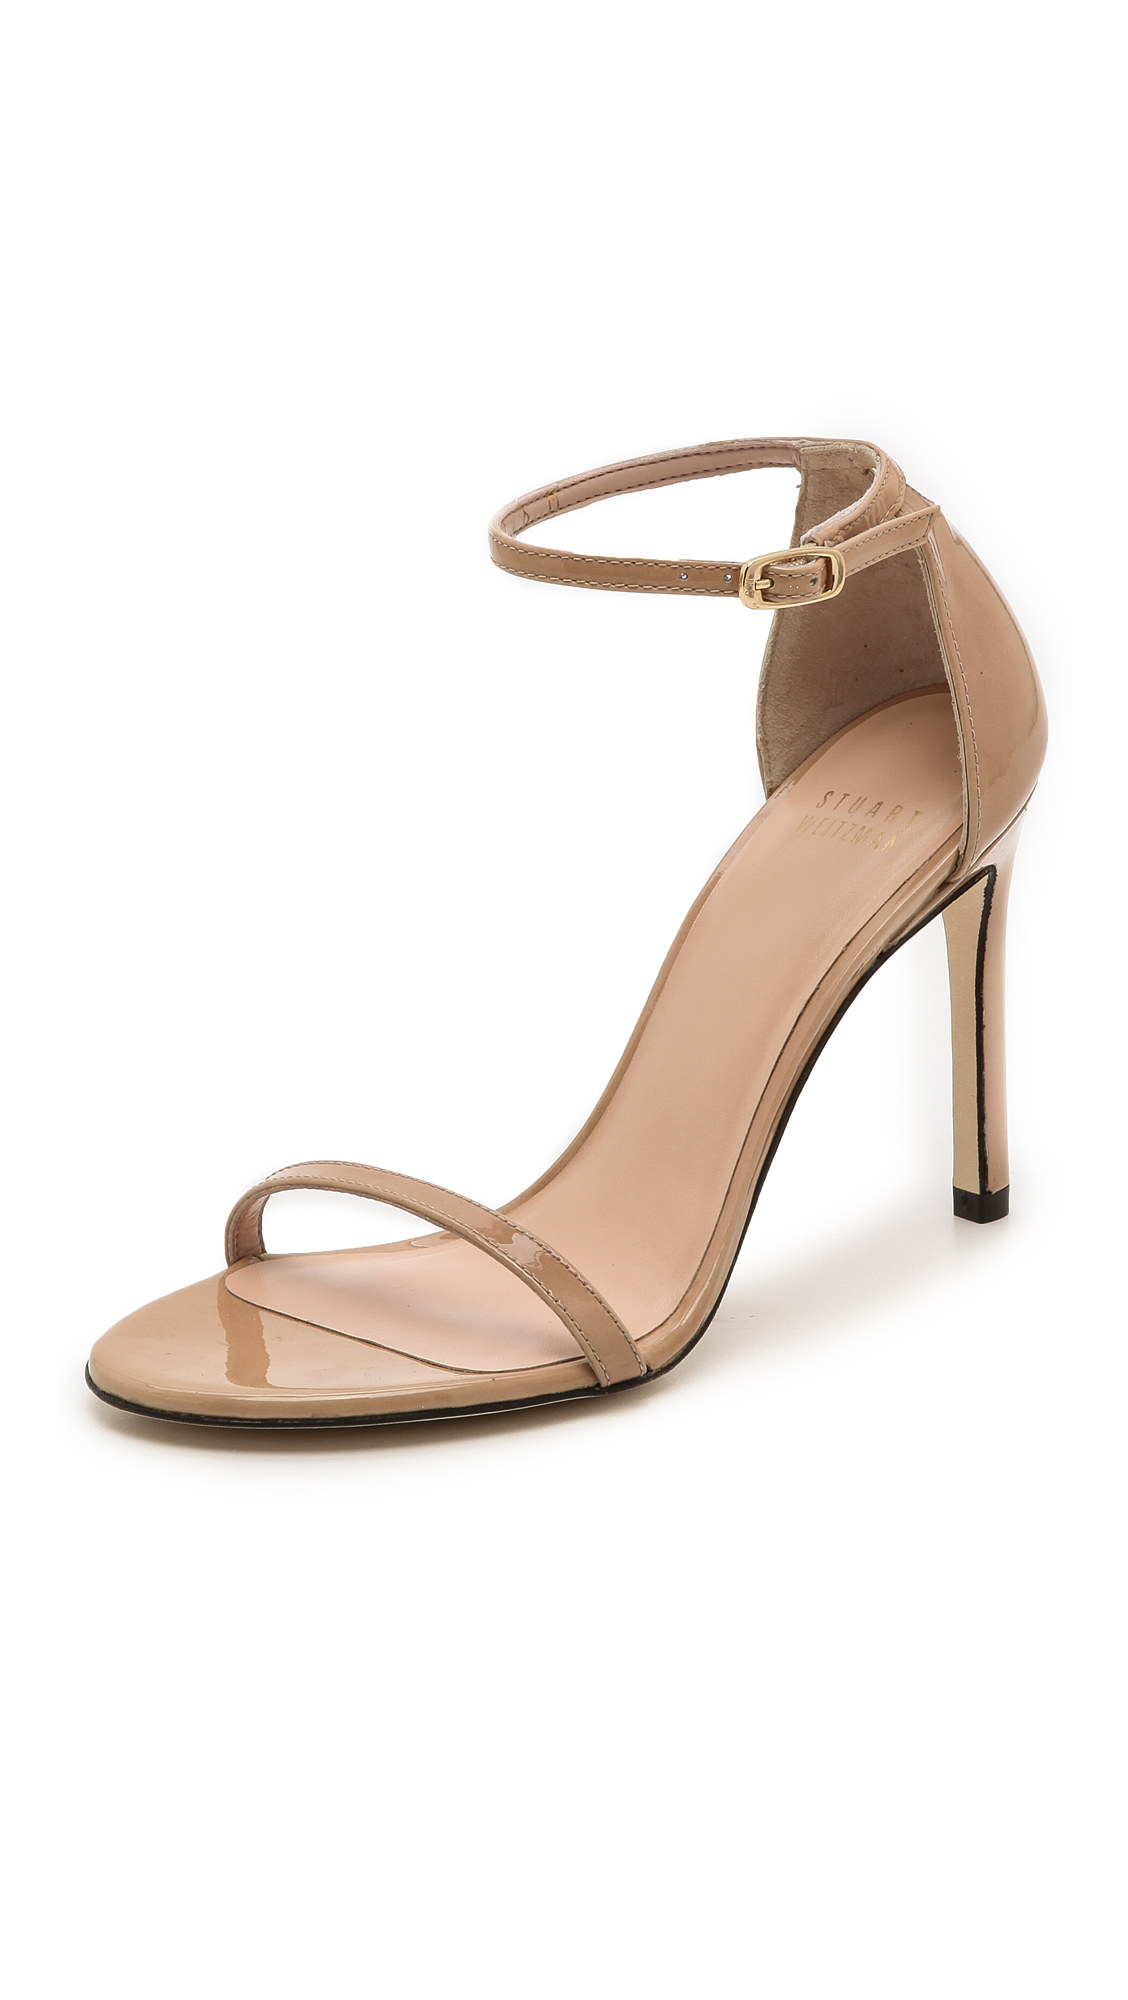 4dd9f31d9fb Stuart Weitzman Nudistsong 100Mm Sandals In Adobe